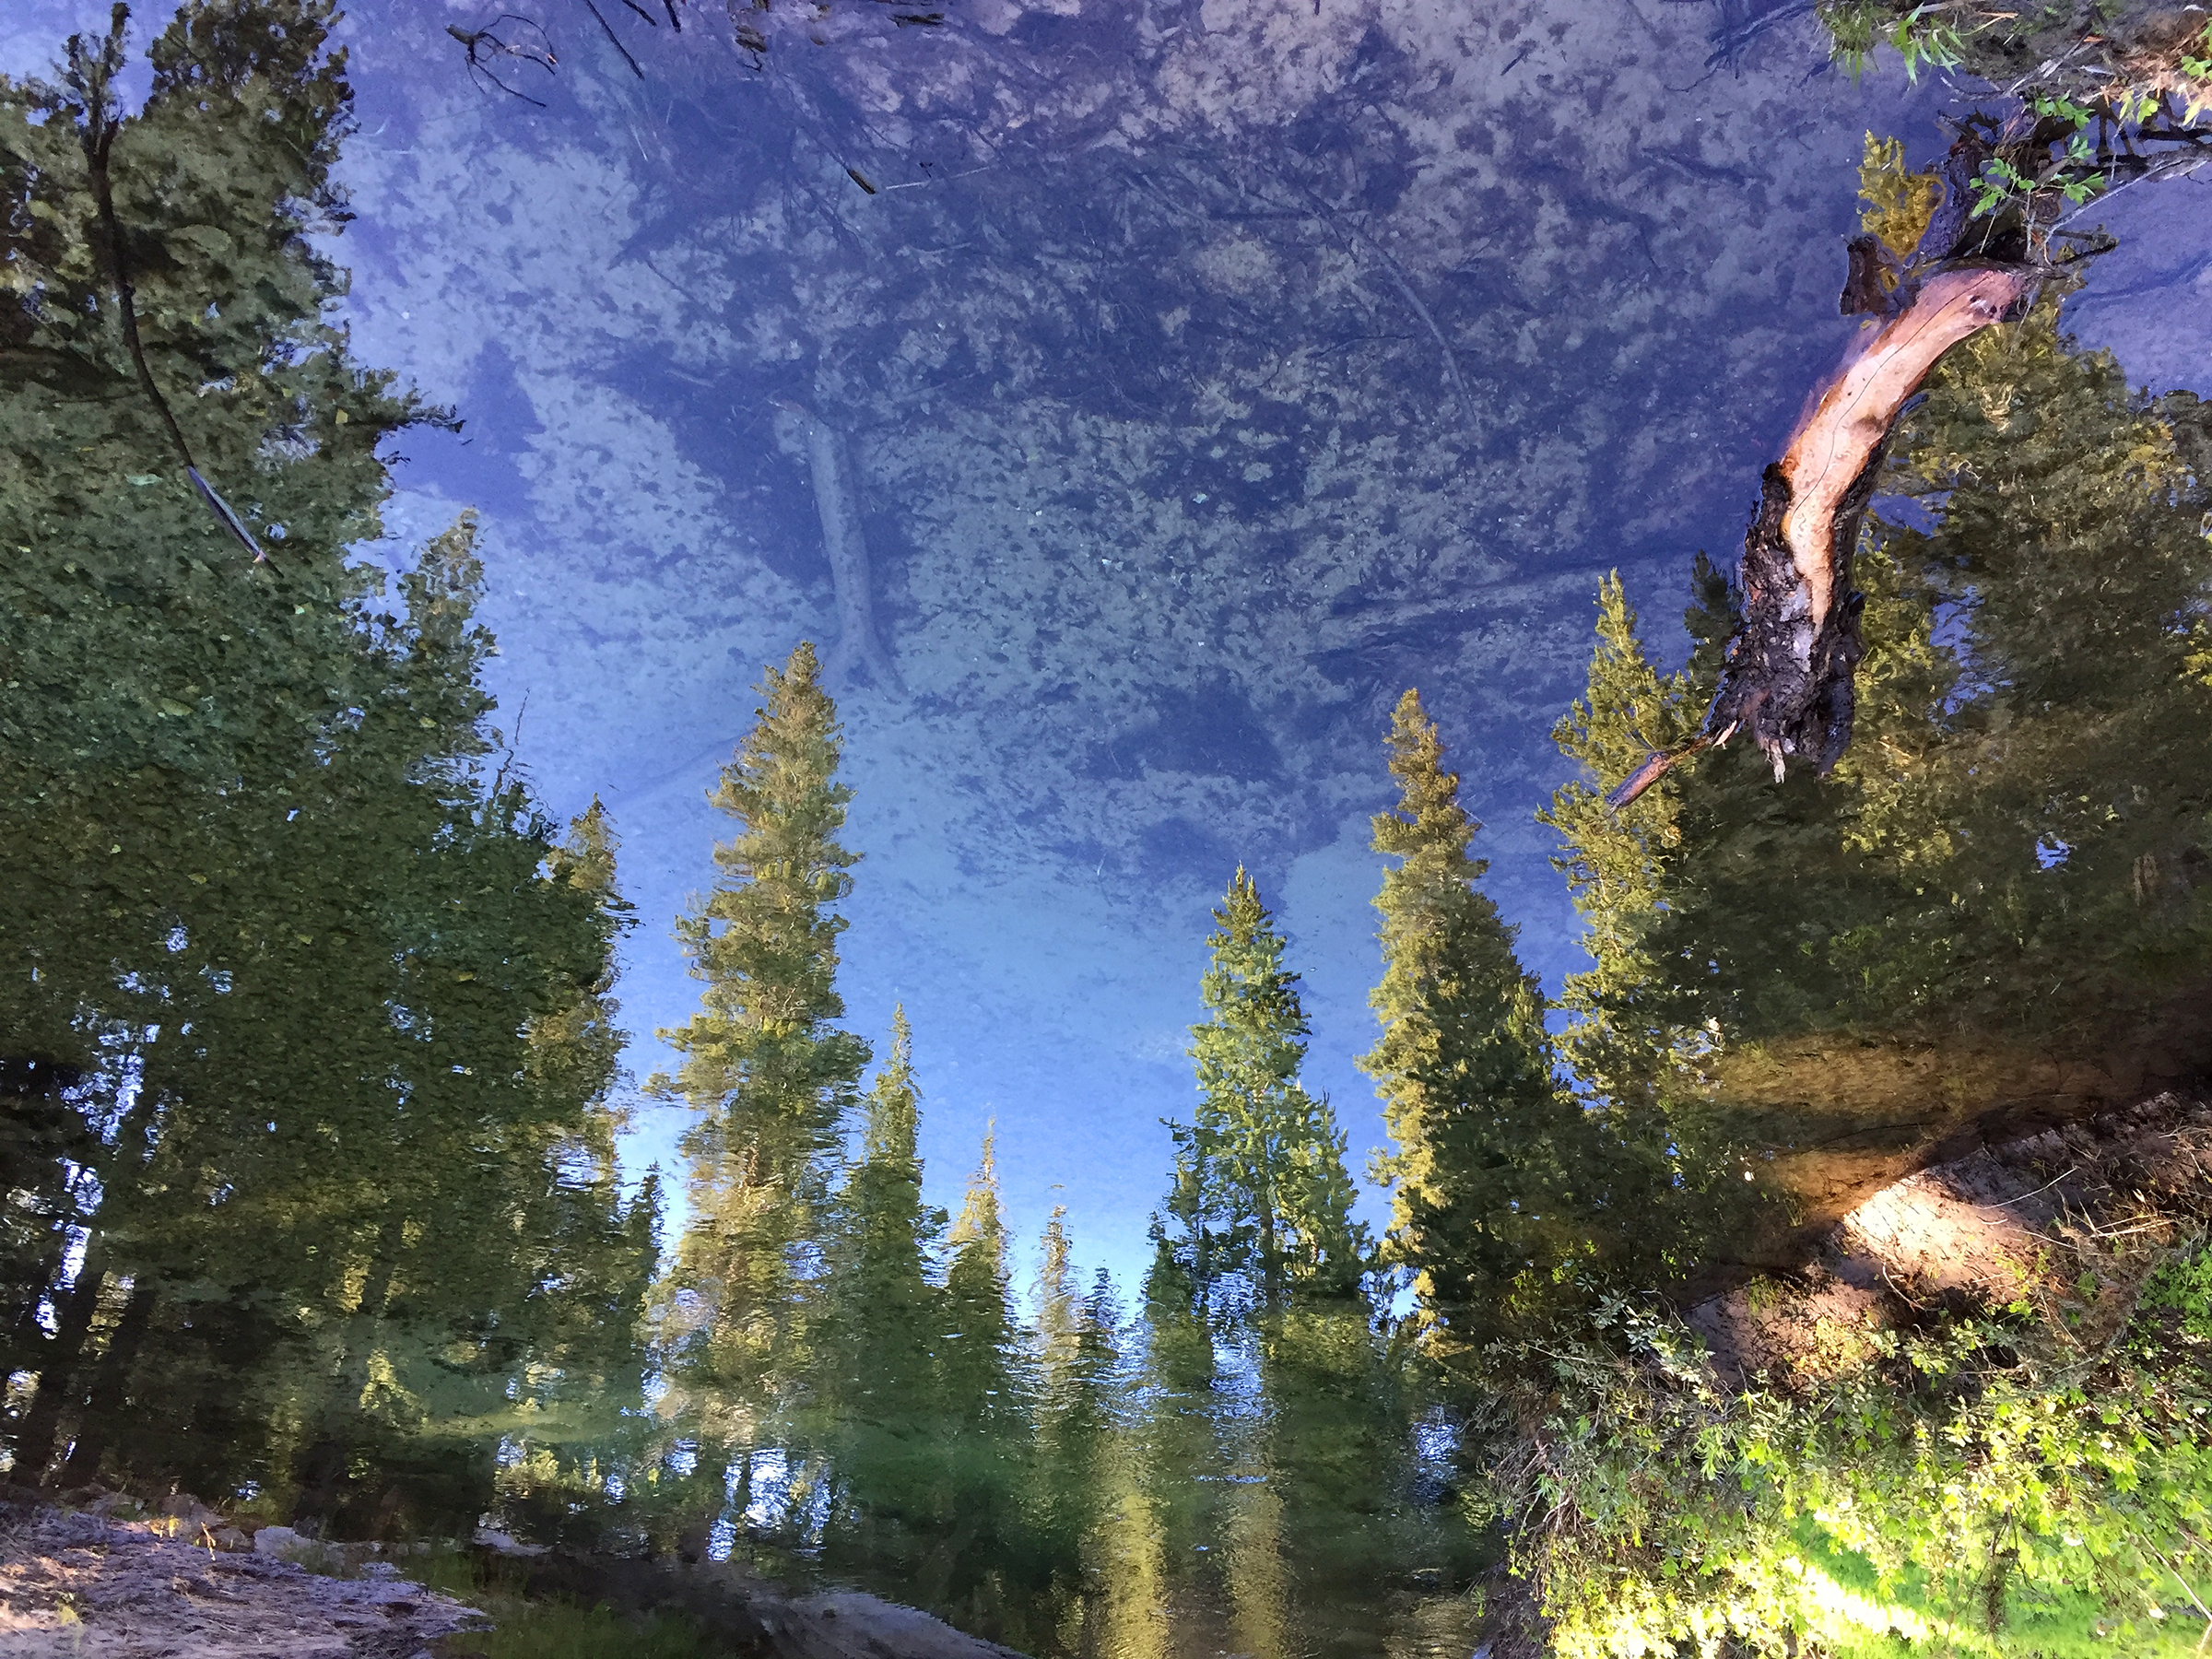 trailname-backstroke-sierra-high-route-2017_0349.jpg